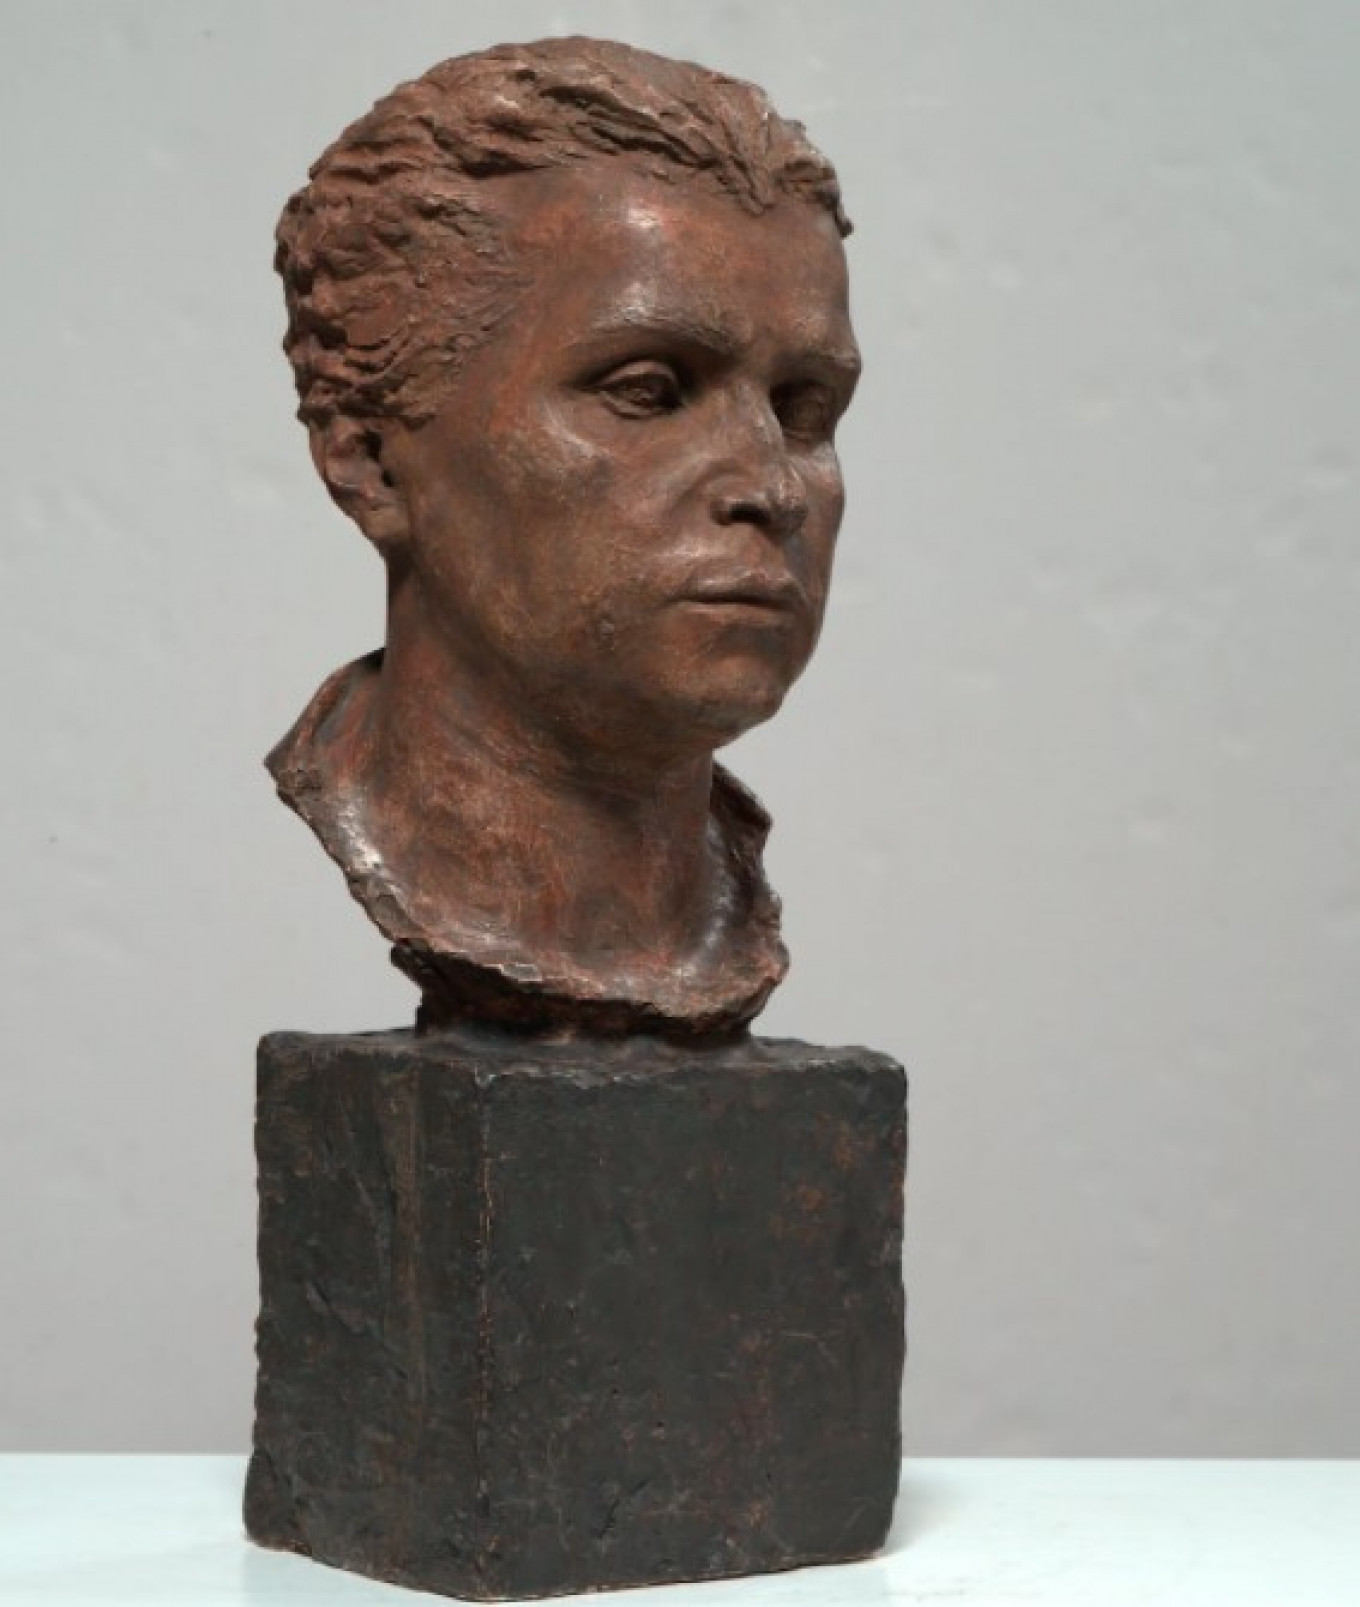 Portrait of sculptor Vera Mukhina, 1939 State Tretyakov Gallery